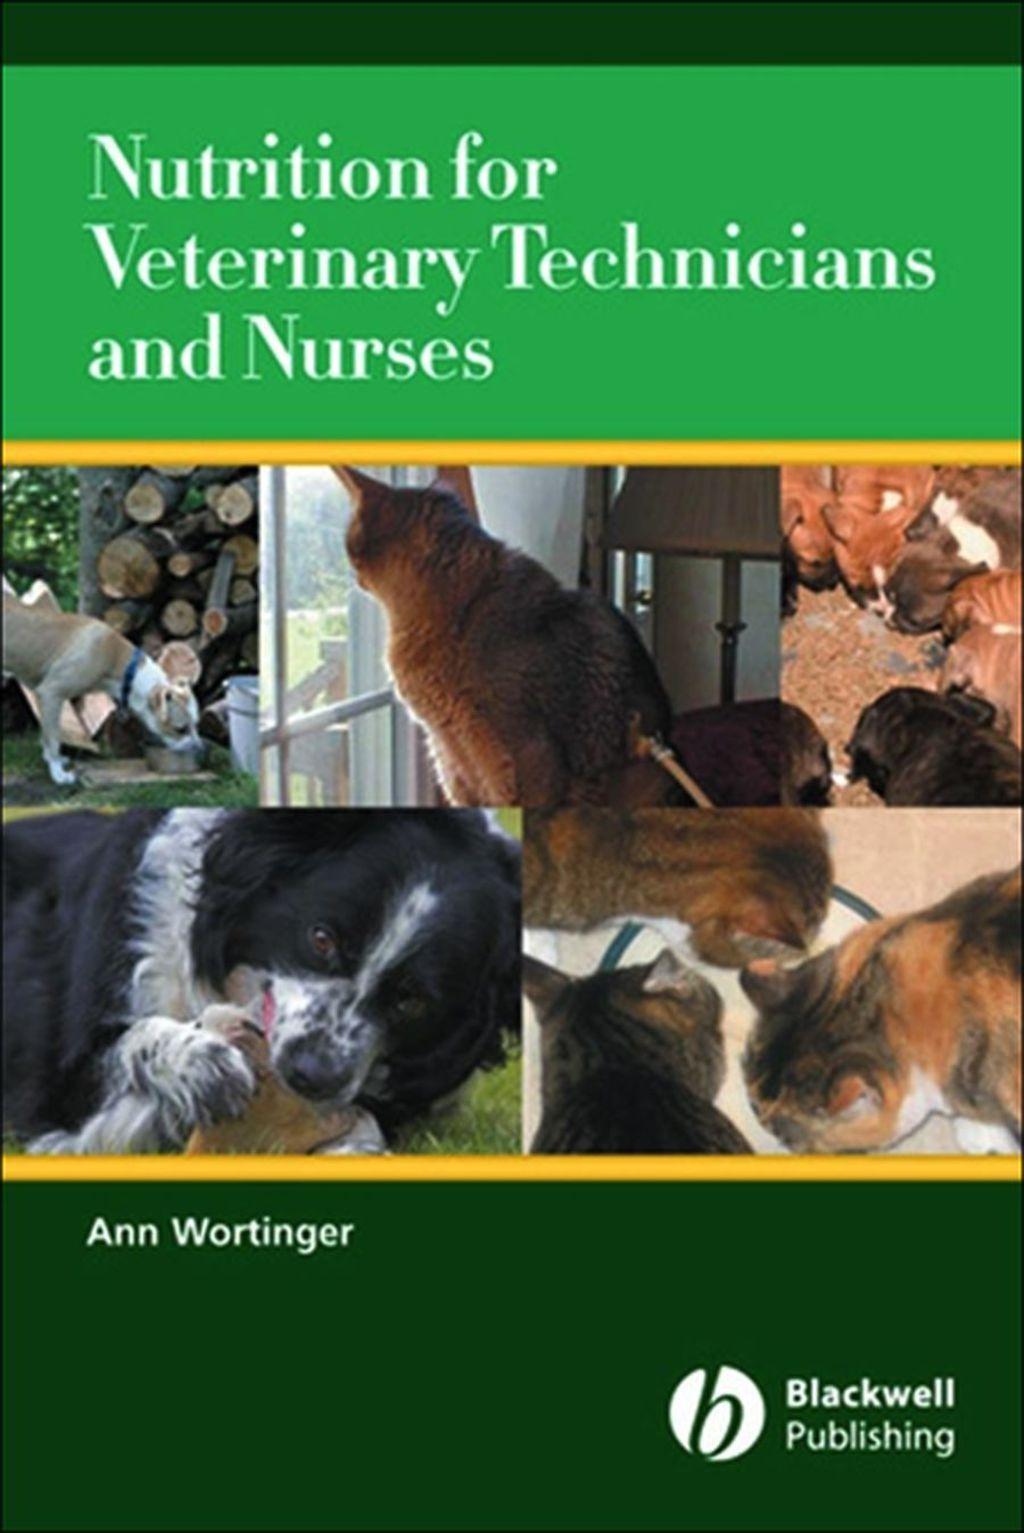 Nutrition for Veterinary Technicians and Nurses (eBook